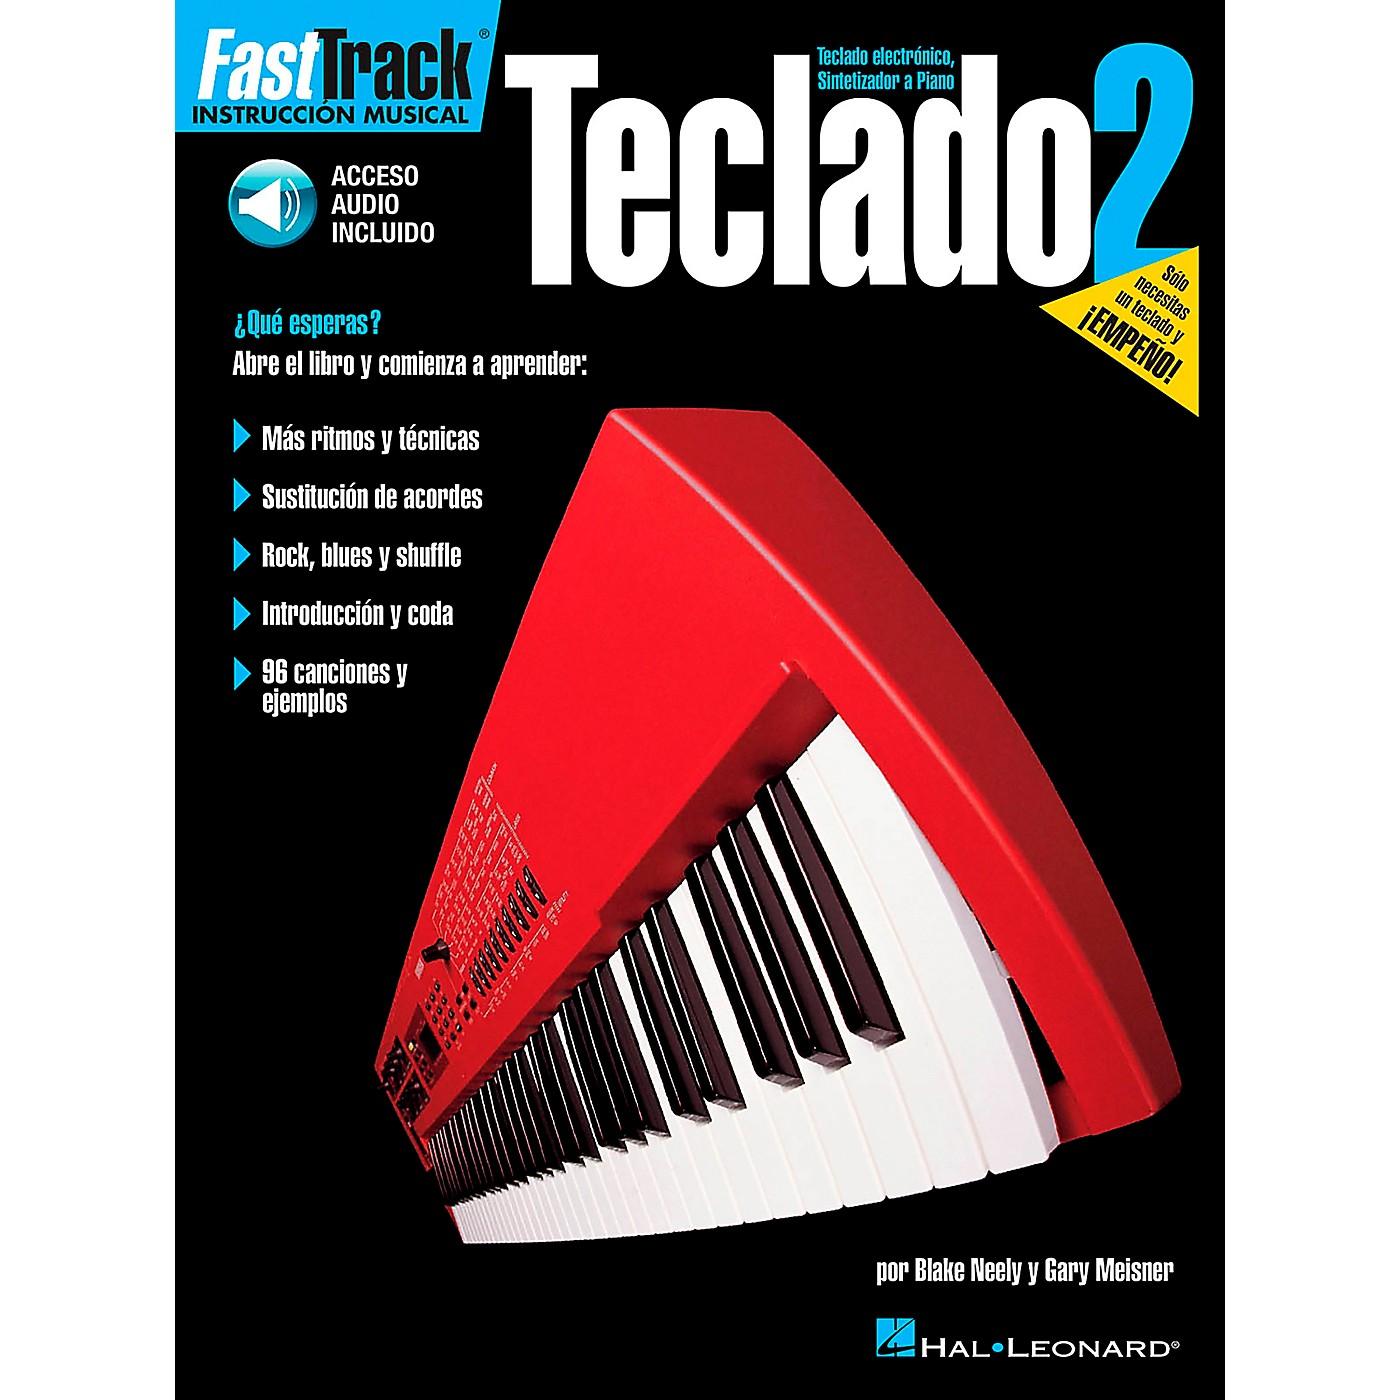 Hal Leonard FastTrack Keyboard Method Book 2 Book/CD - Spanish Edition thumbnail